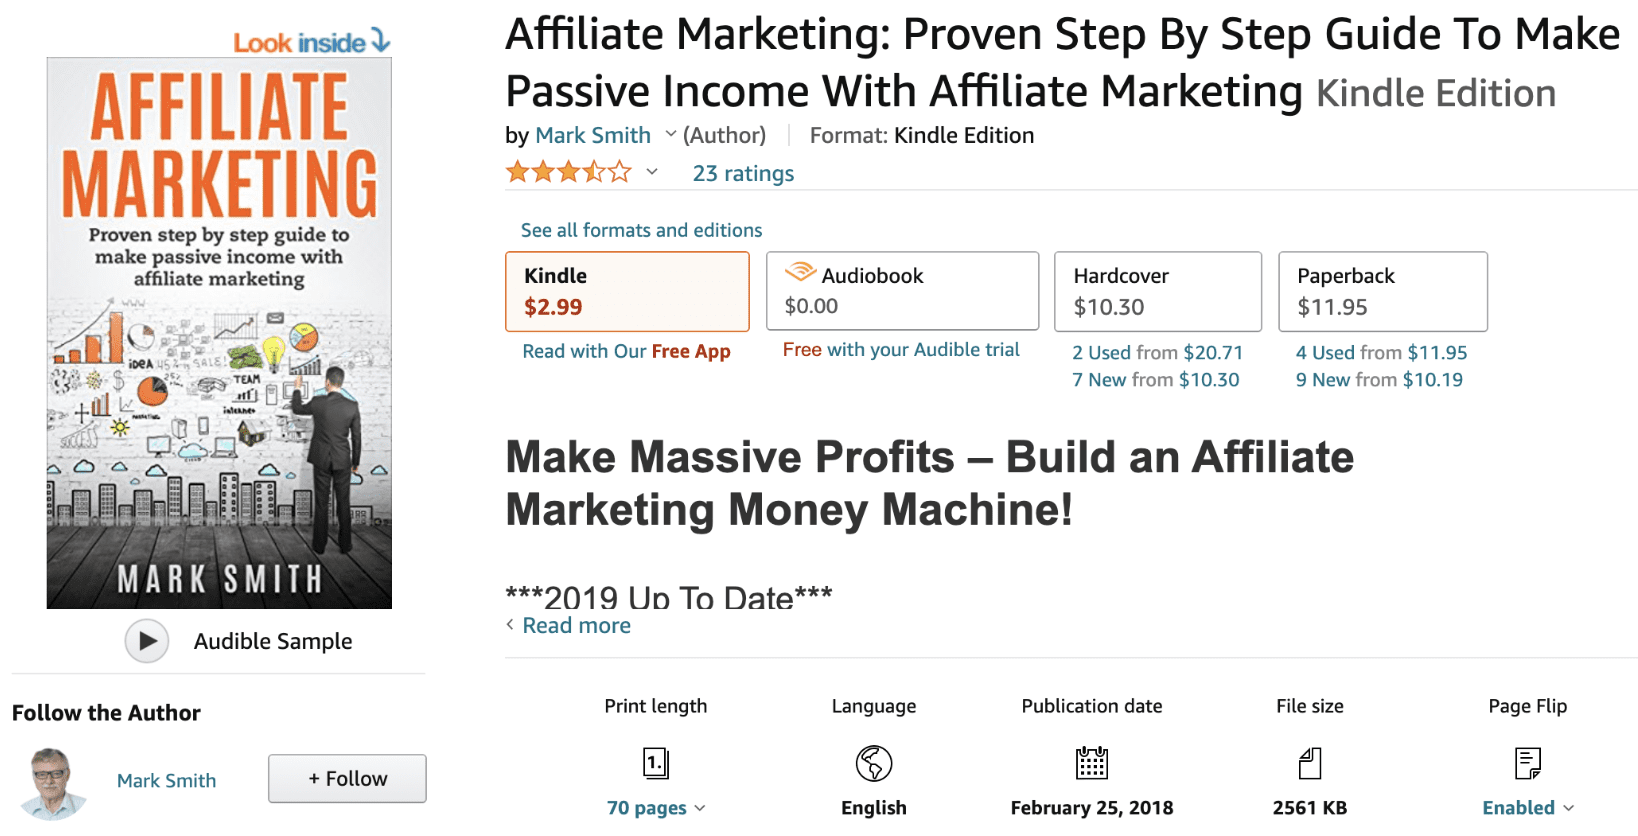 Affiliate Marketing by Mark Smith